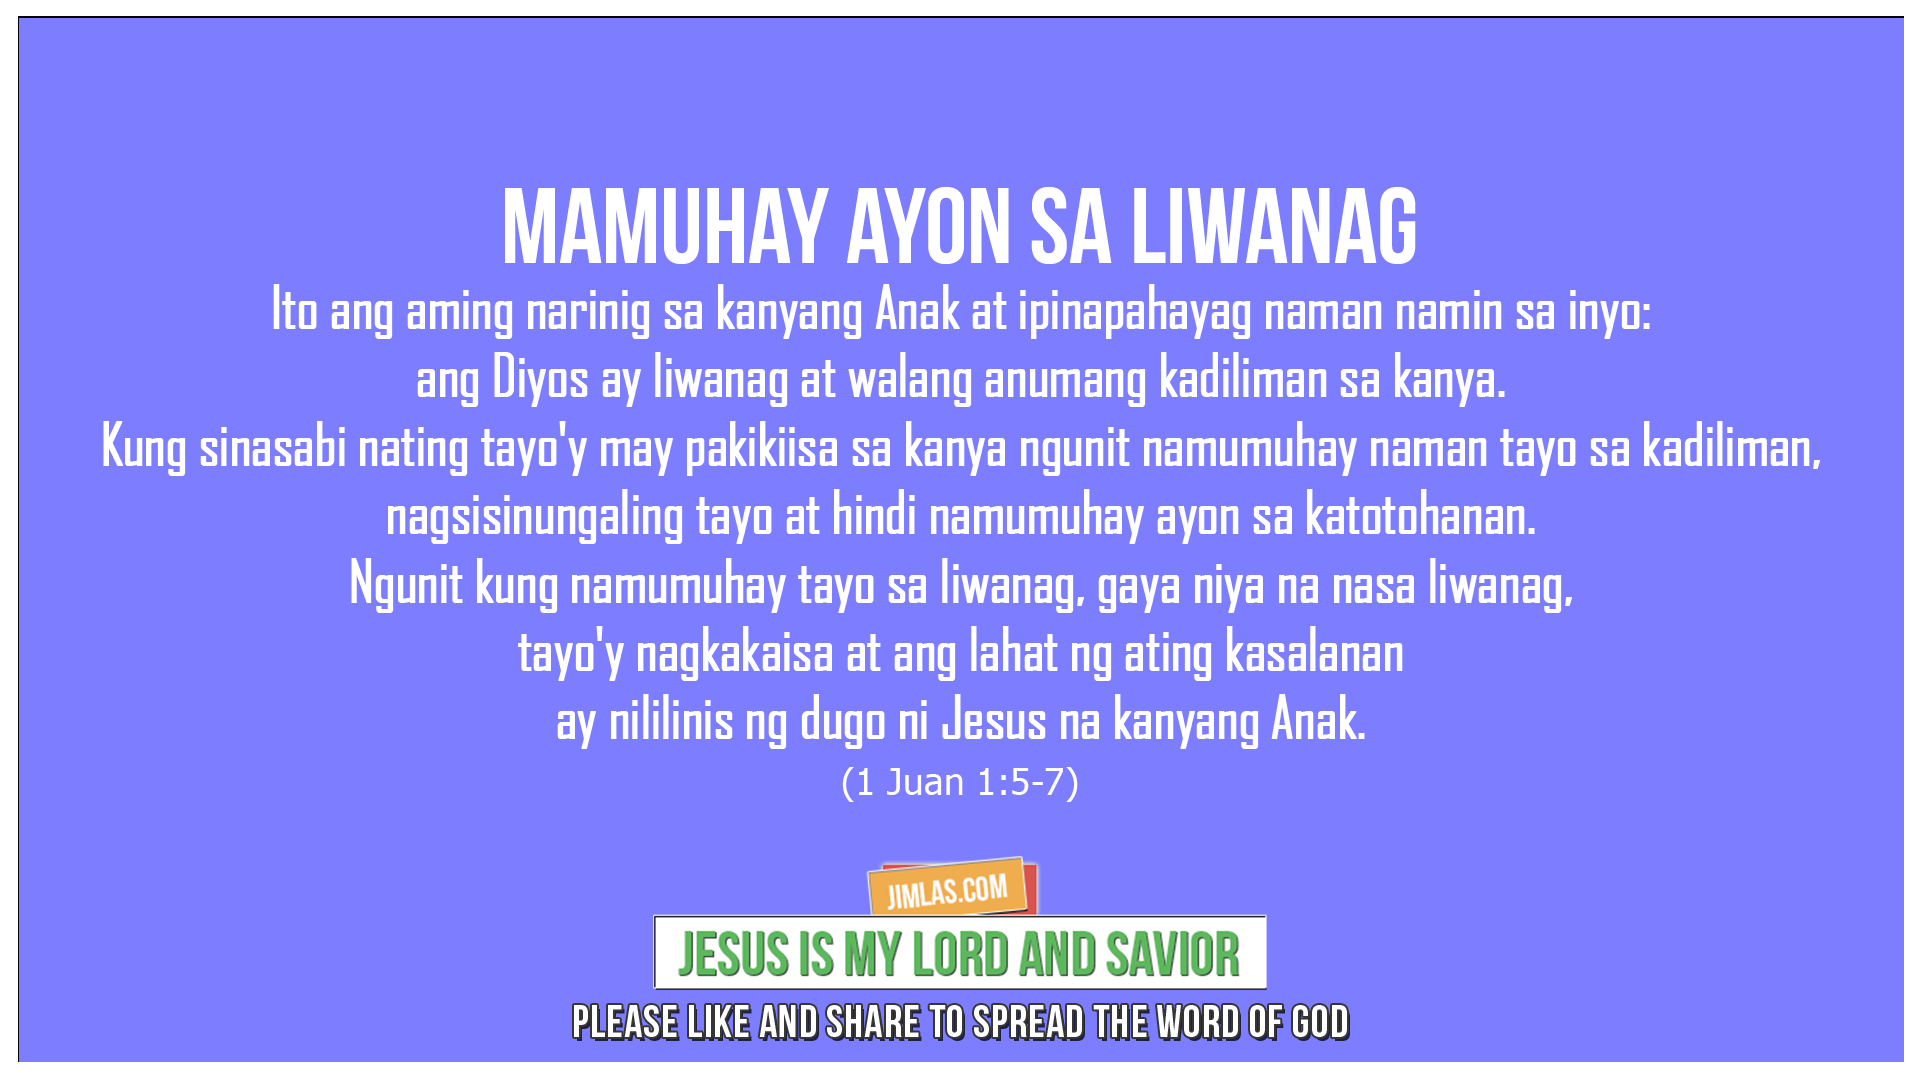 1 Juan 1:5-7, 1 Juan 1:5-7